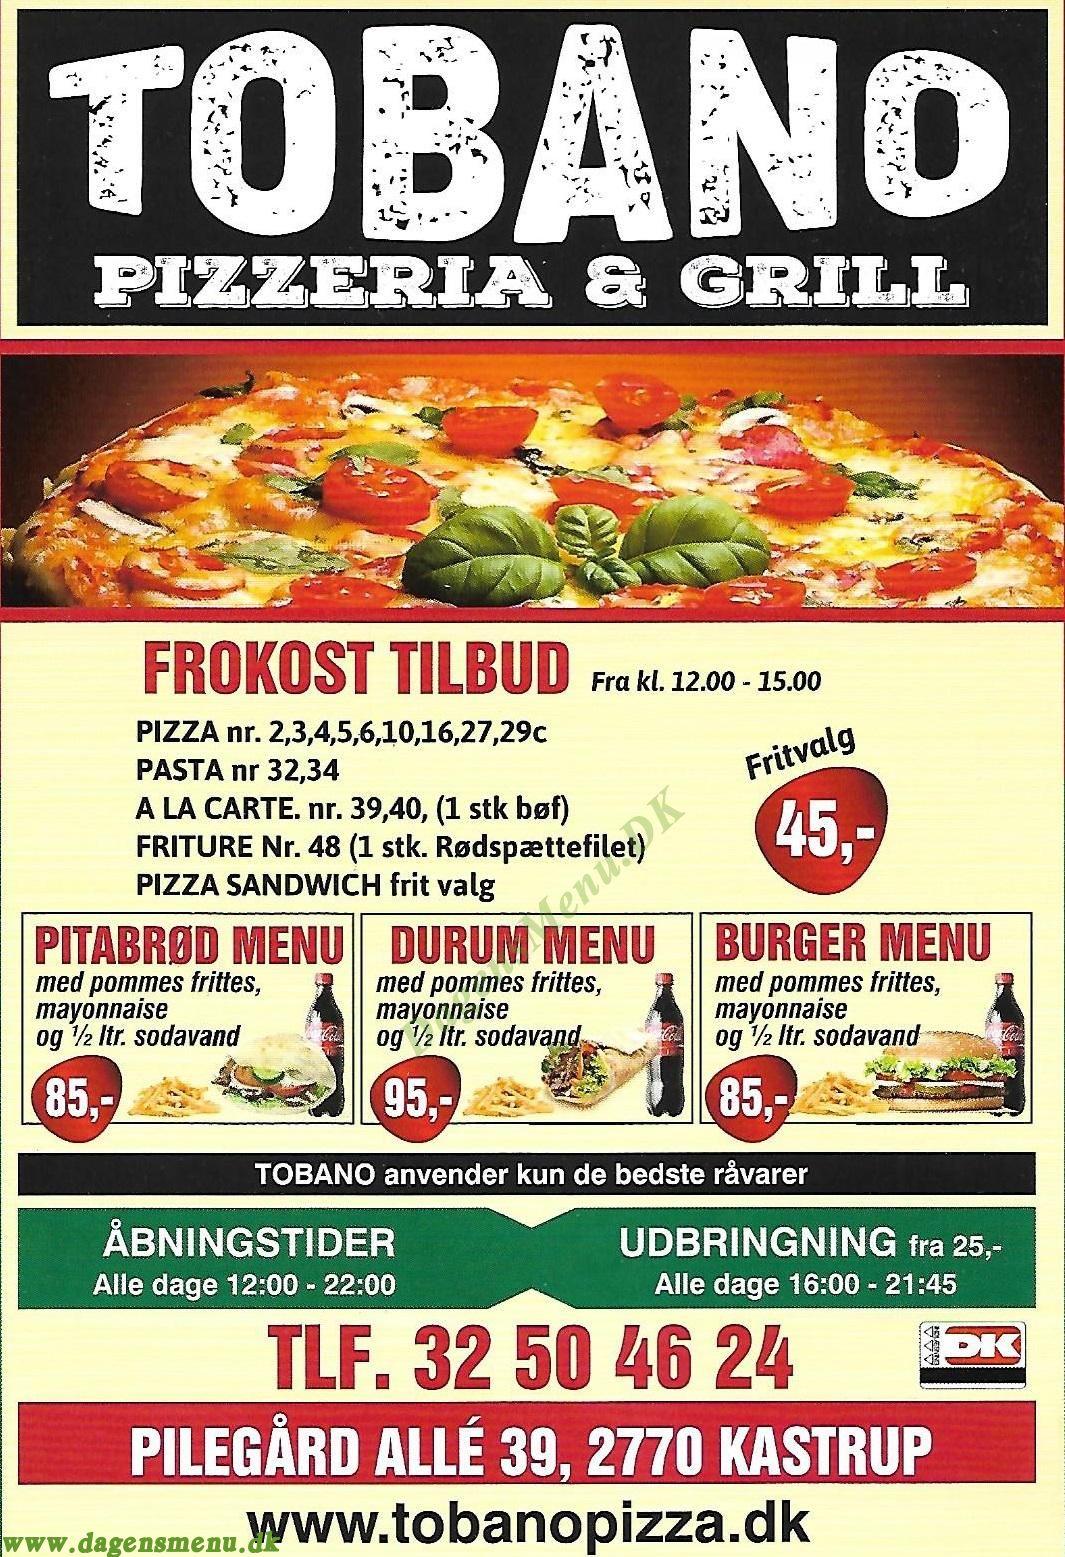 Tobano Pizzeria & Grill - Menukort